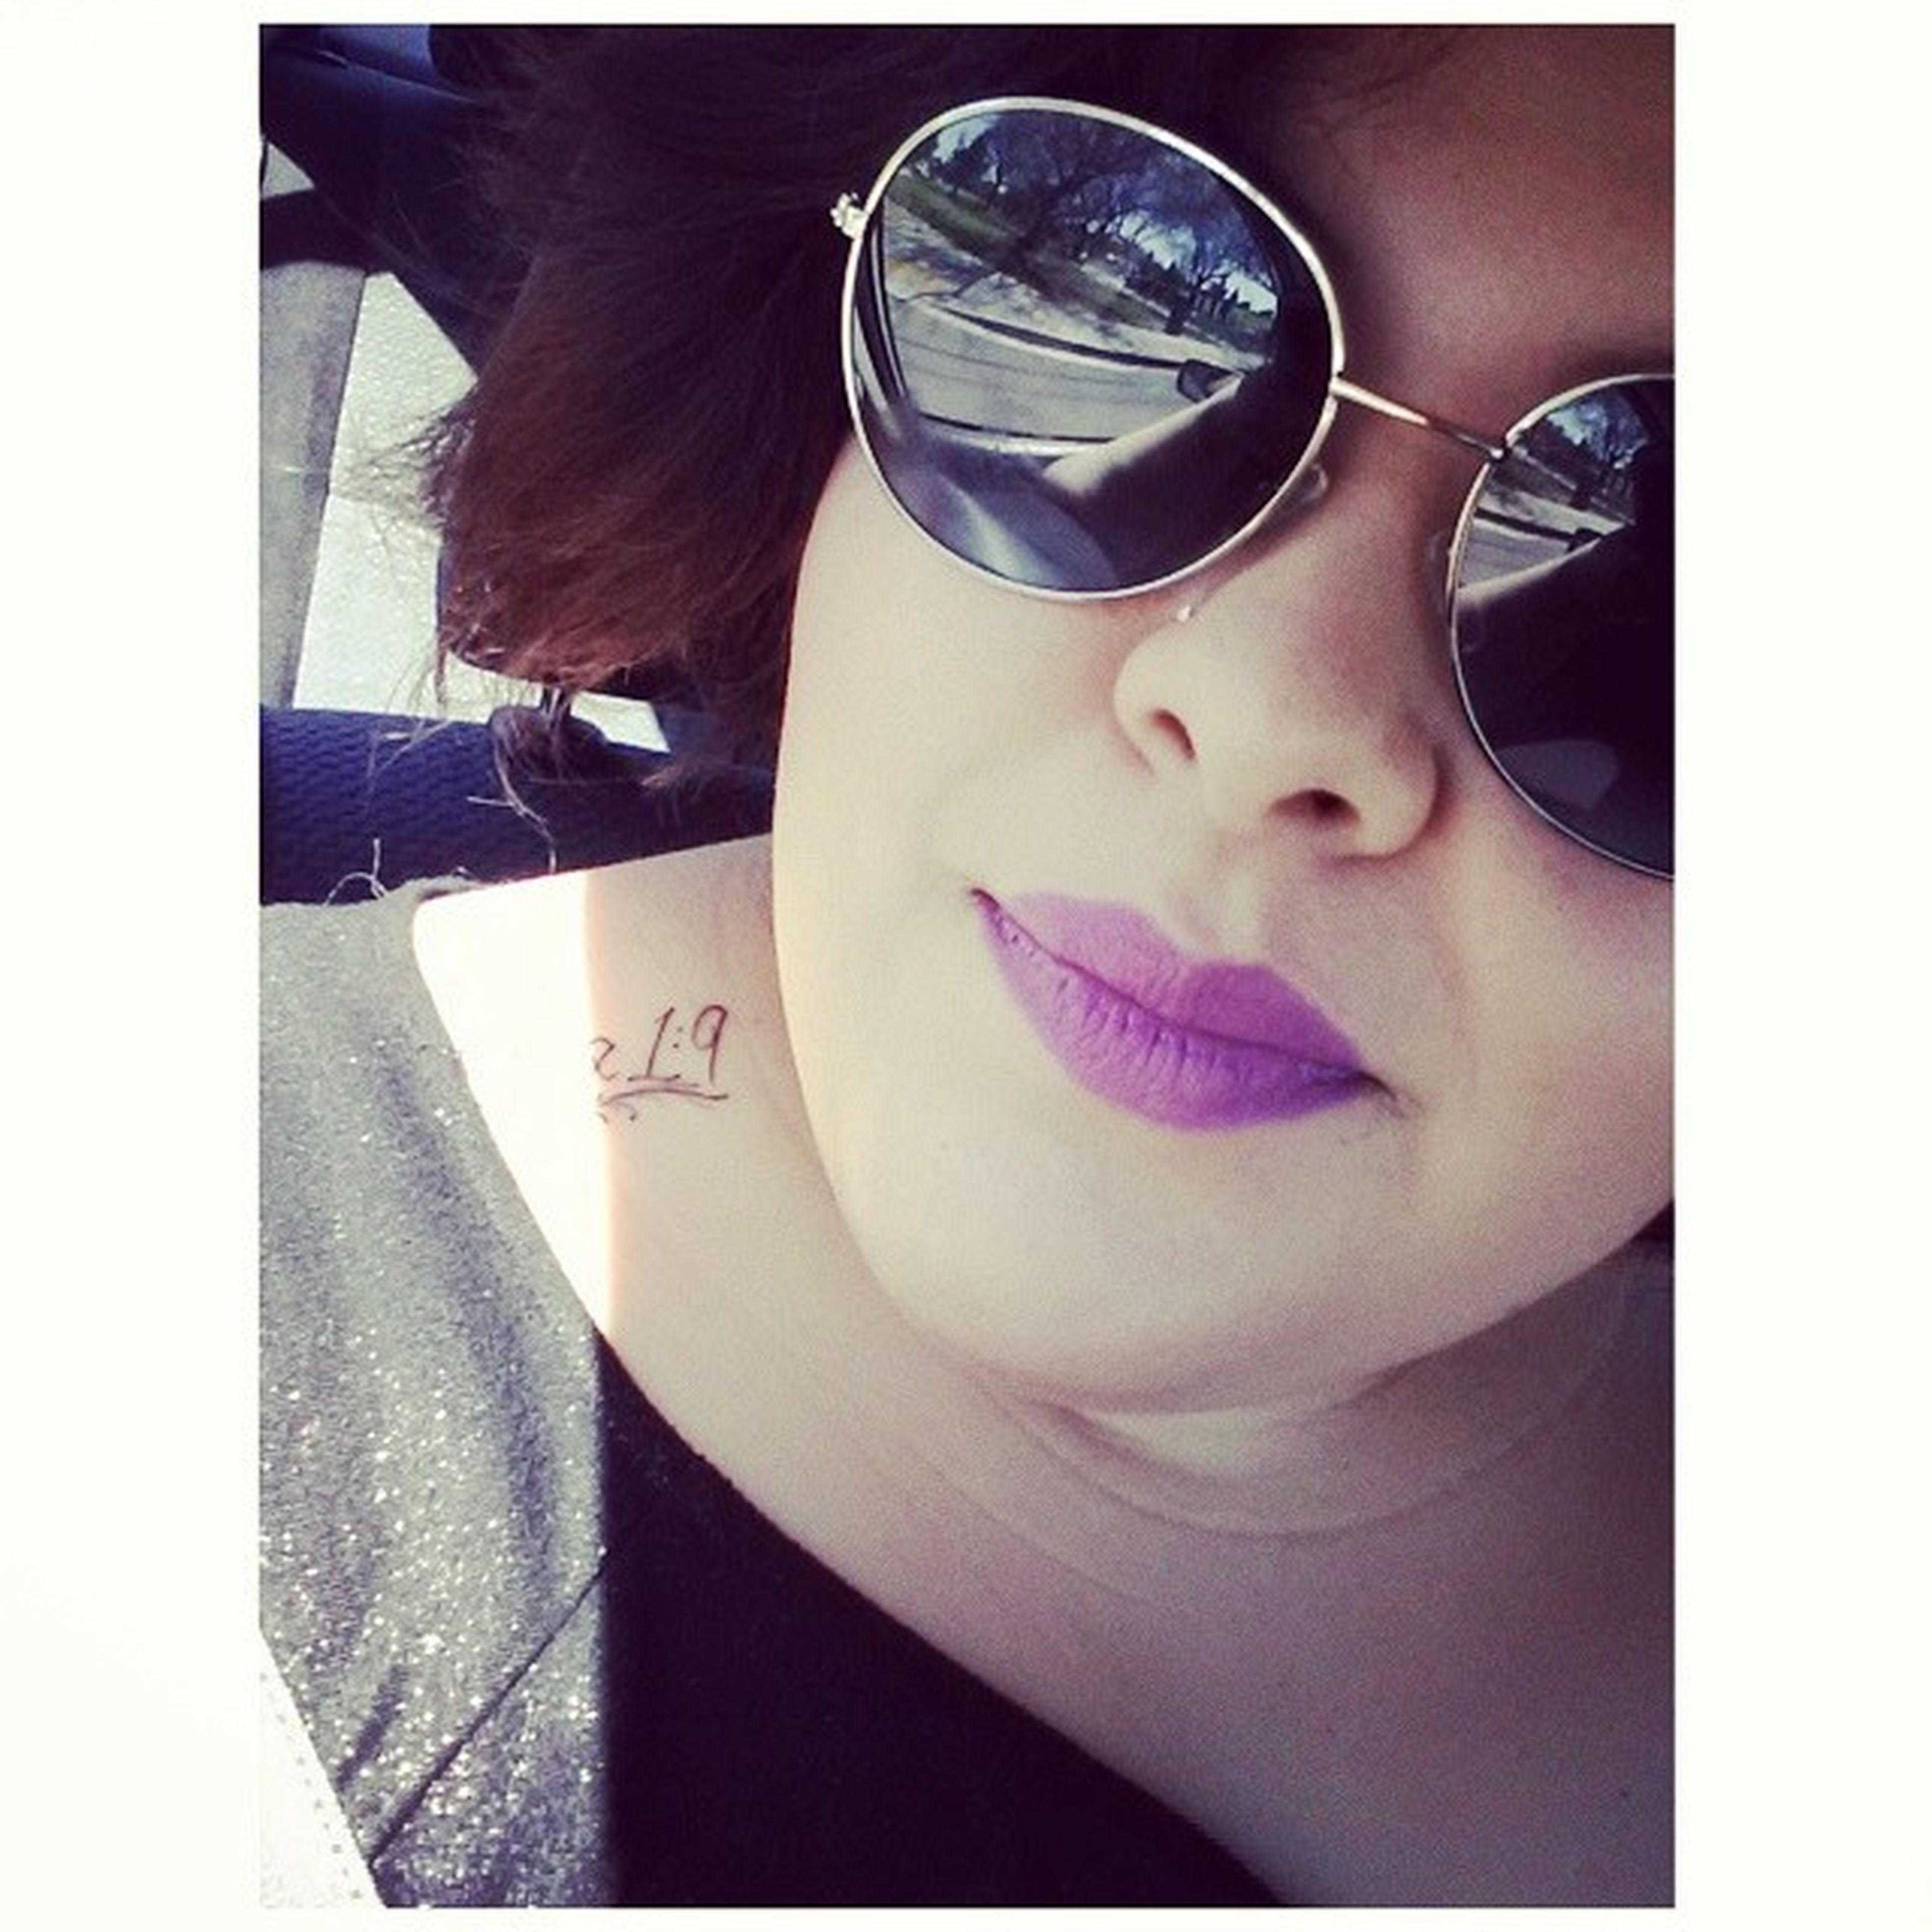 Purpleiips Occcosmetics . Summertimesadness Iwokeuplikethis